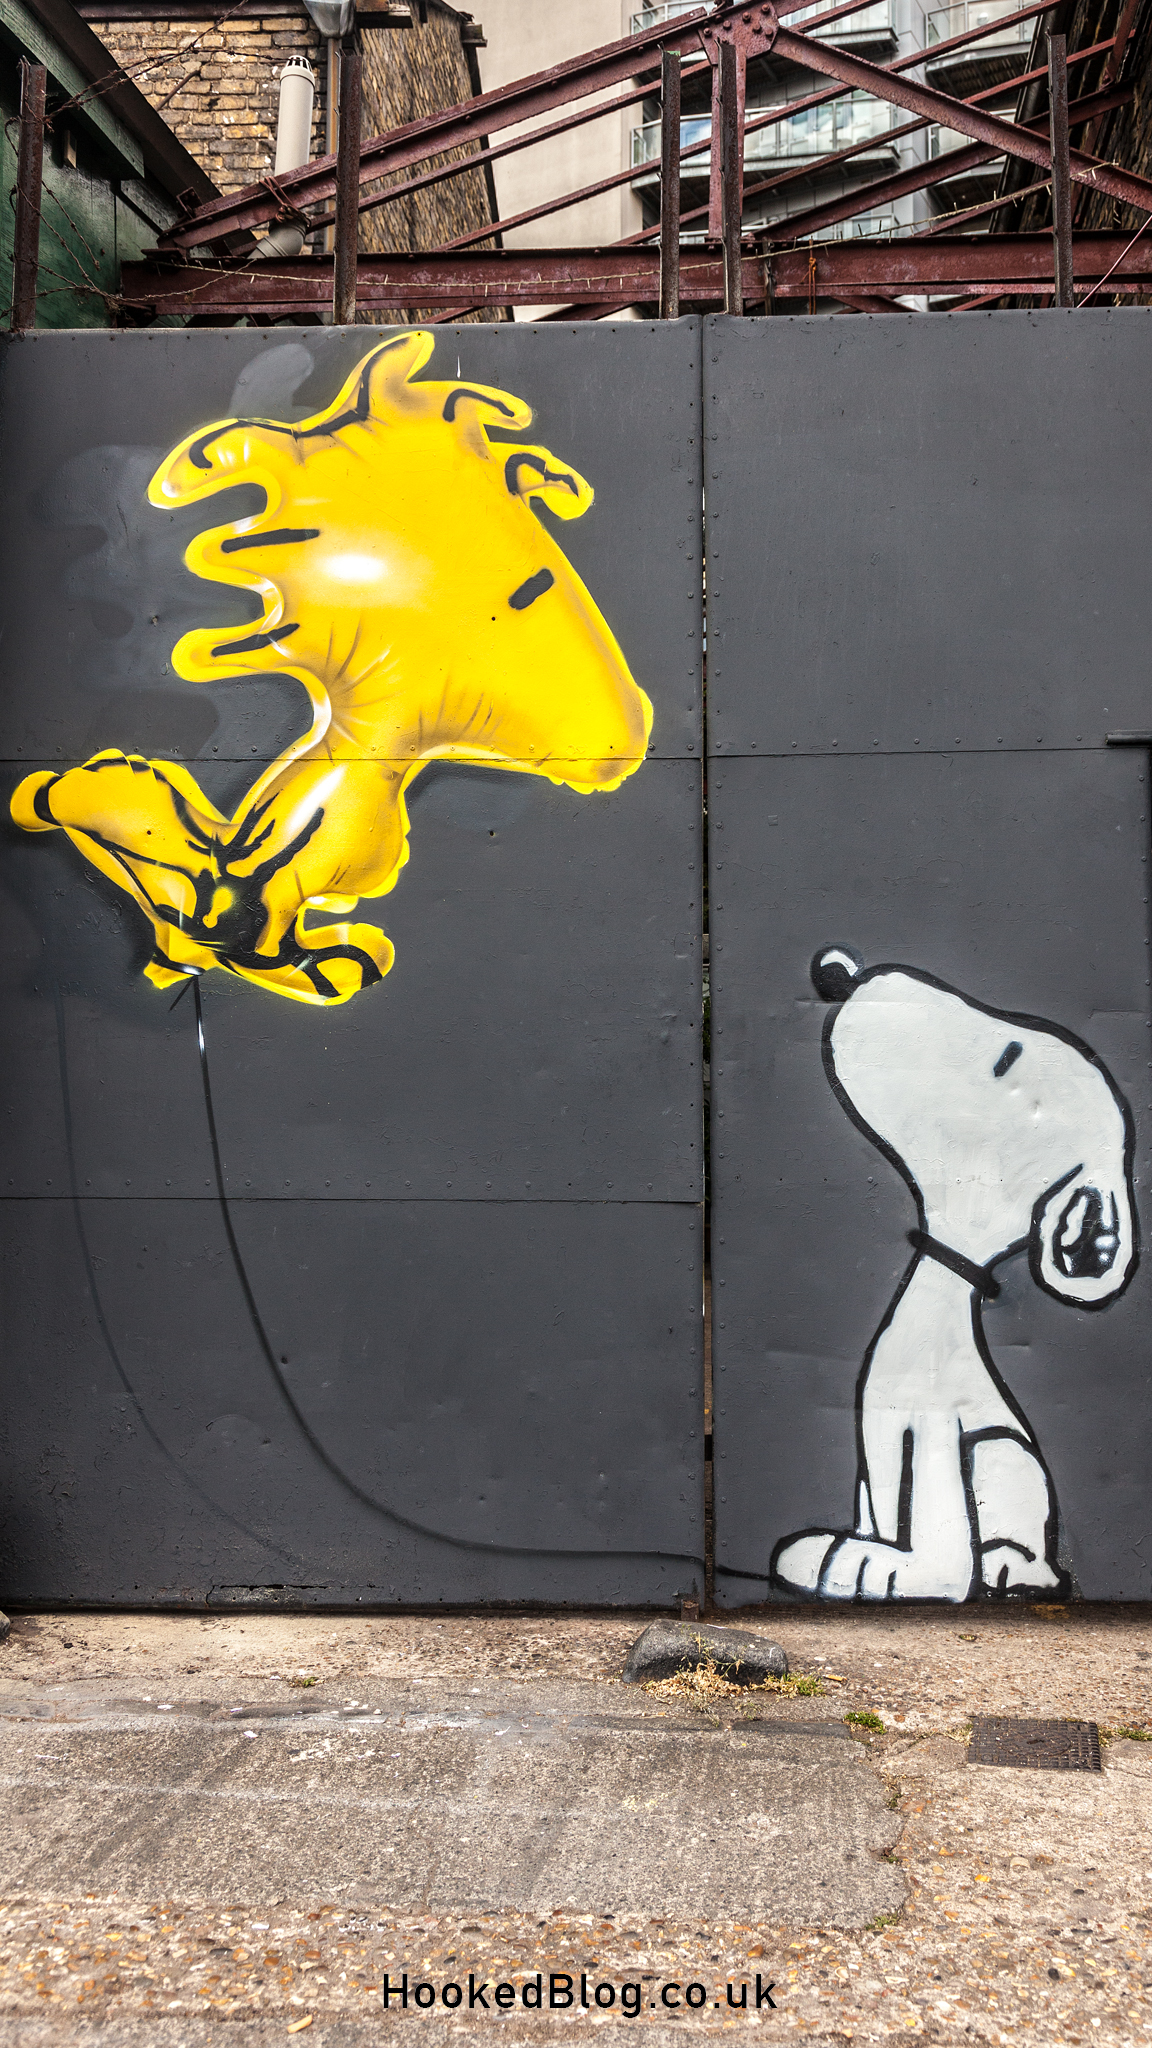 Fanakapan, Woodstock Got High Street Art Mural, London 2017. Photo © Mark Rigney / Hookedblog